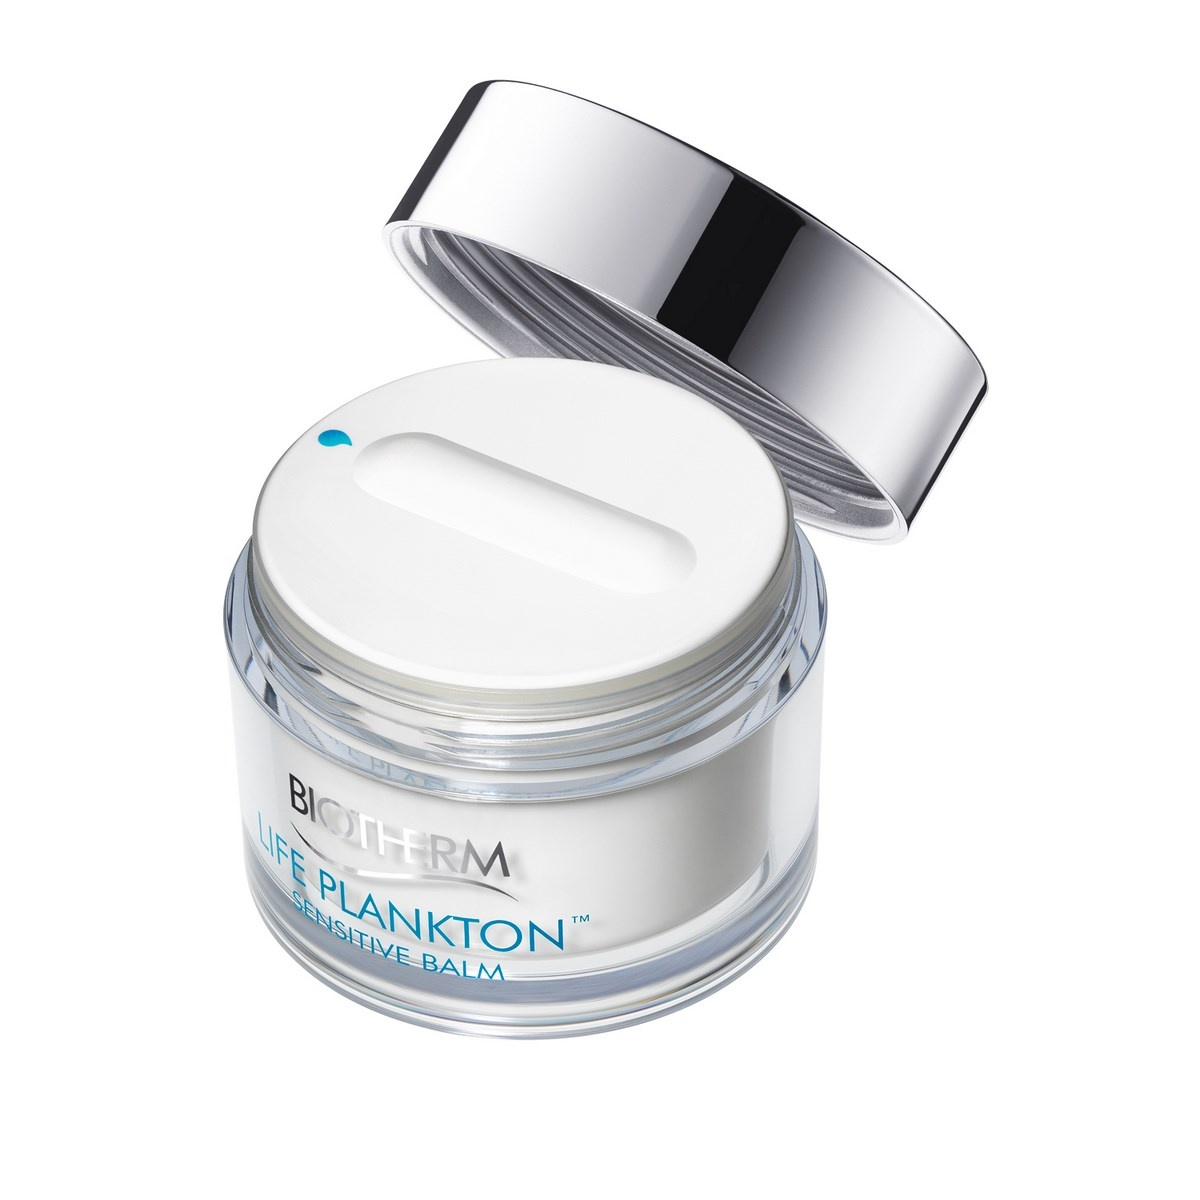 Biotherm Life Plankton Sensitive Balm, 50 ml